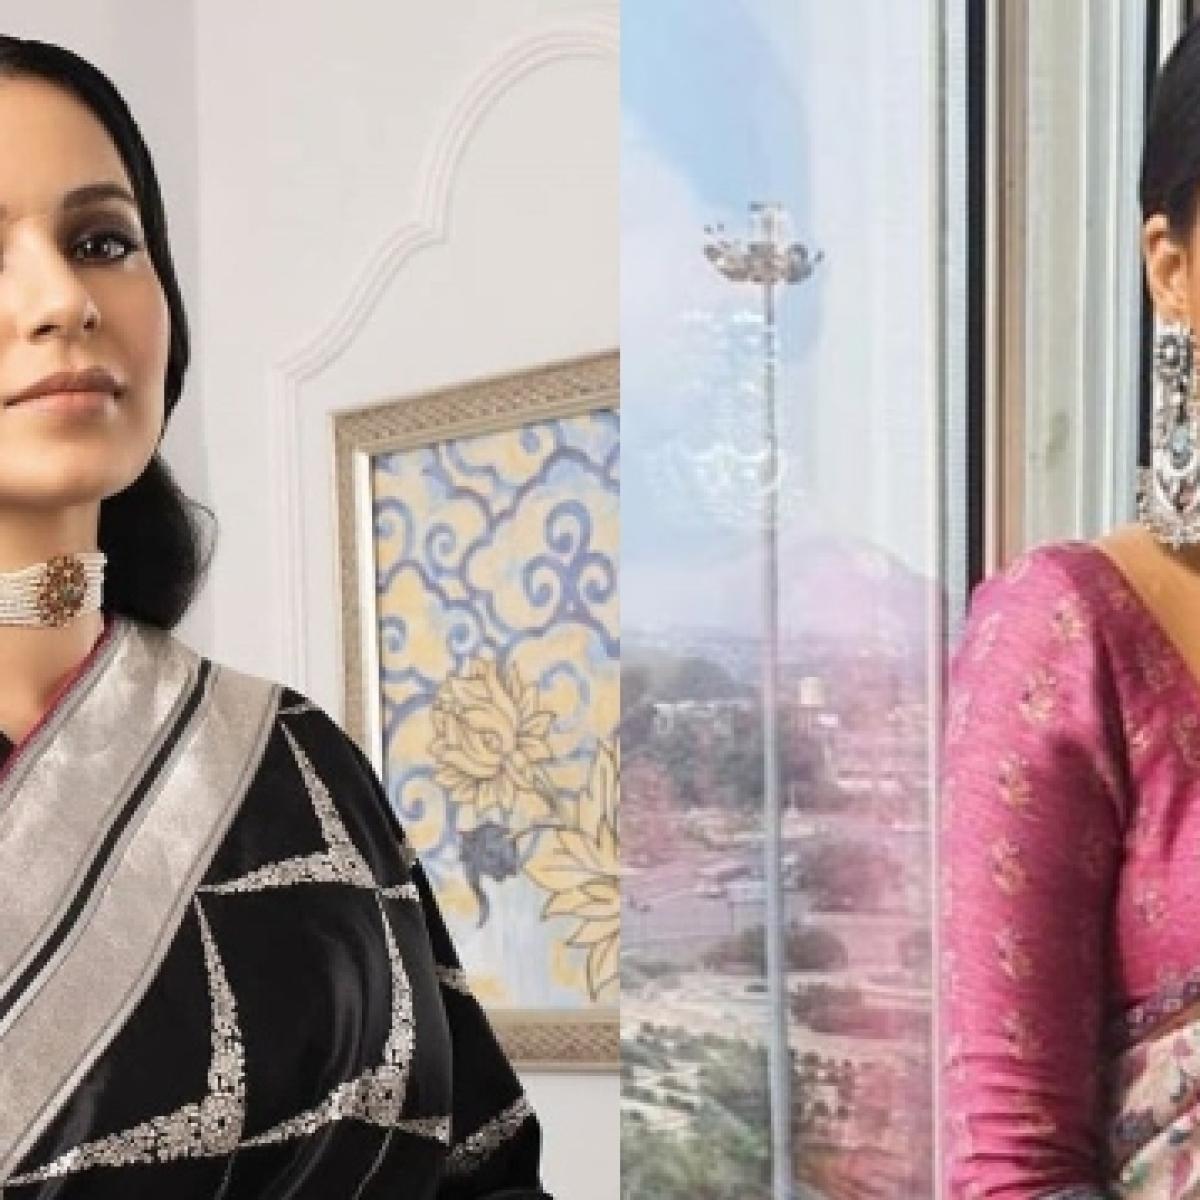 Ballabhgarh murder case: Kangana Ranaut, Swara Bhasker and other Bollywood celebs demand justice for Nikita Tomar